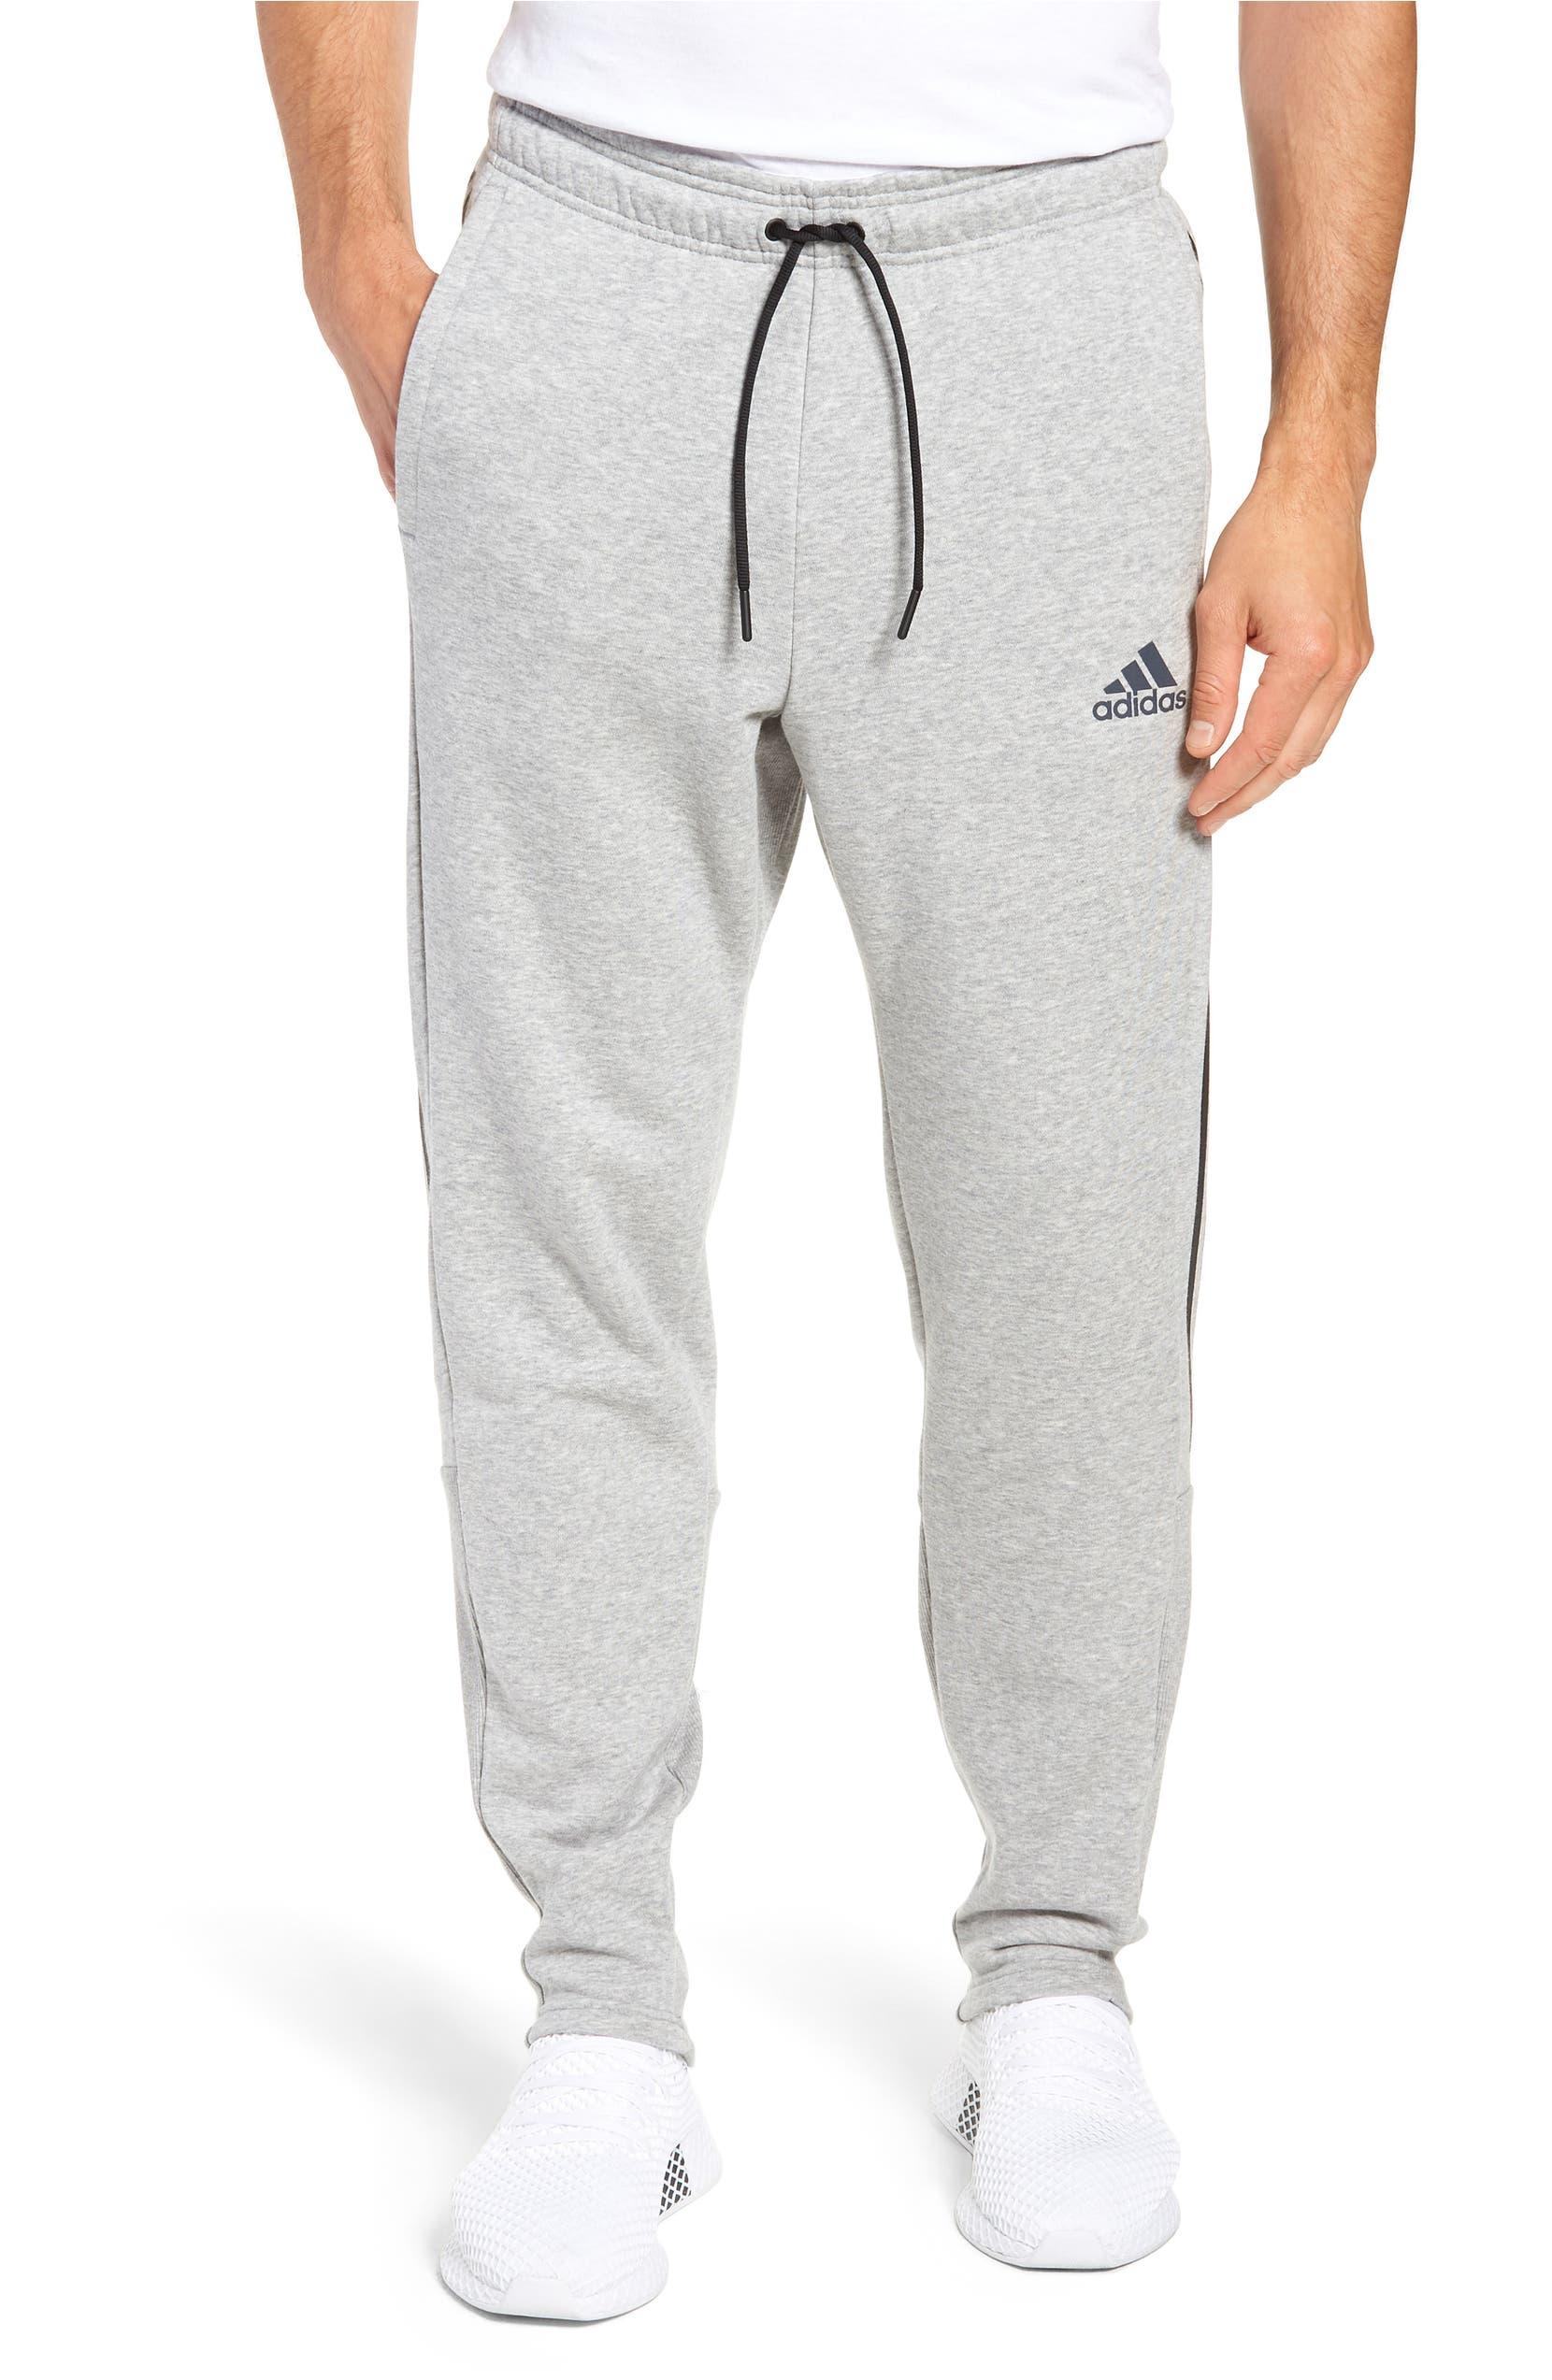 MH 3S Tiro Sweatpants